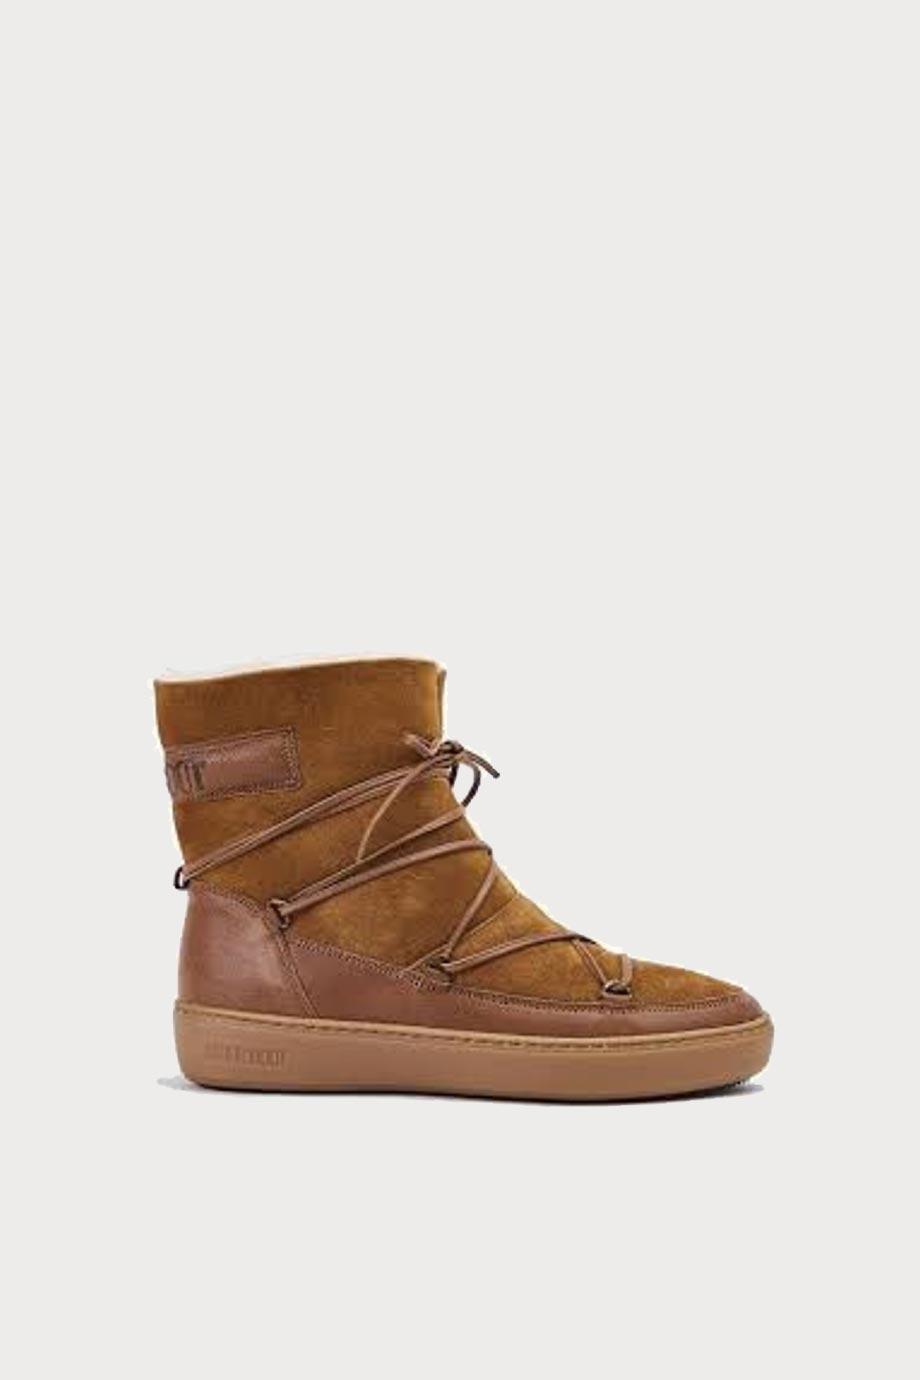 spiridoula metheniti shoes xalkida p 24102700 002 brown low laces MoonBoot